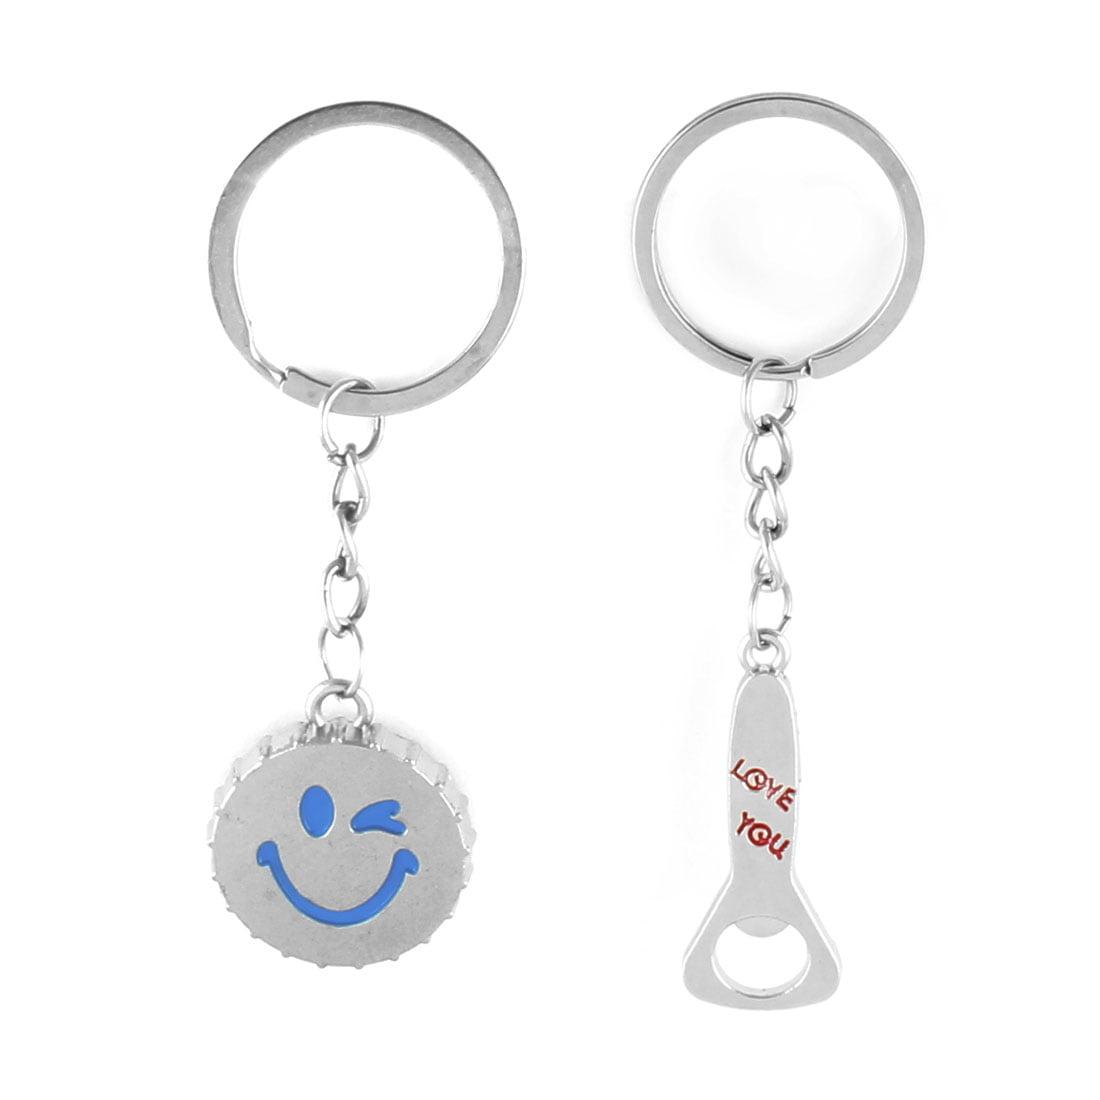 Metal Beer Cap Bottle Opener Shaped Pendant Couple Keychain Key Ring Holder Pair - image 1 de 3